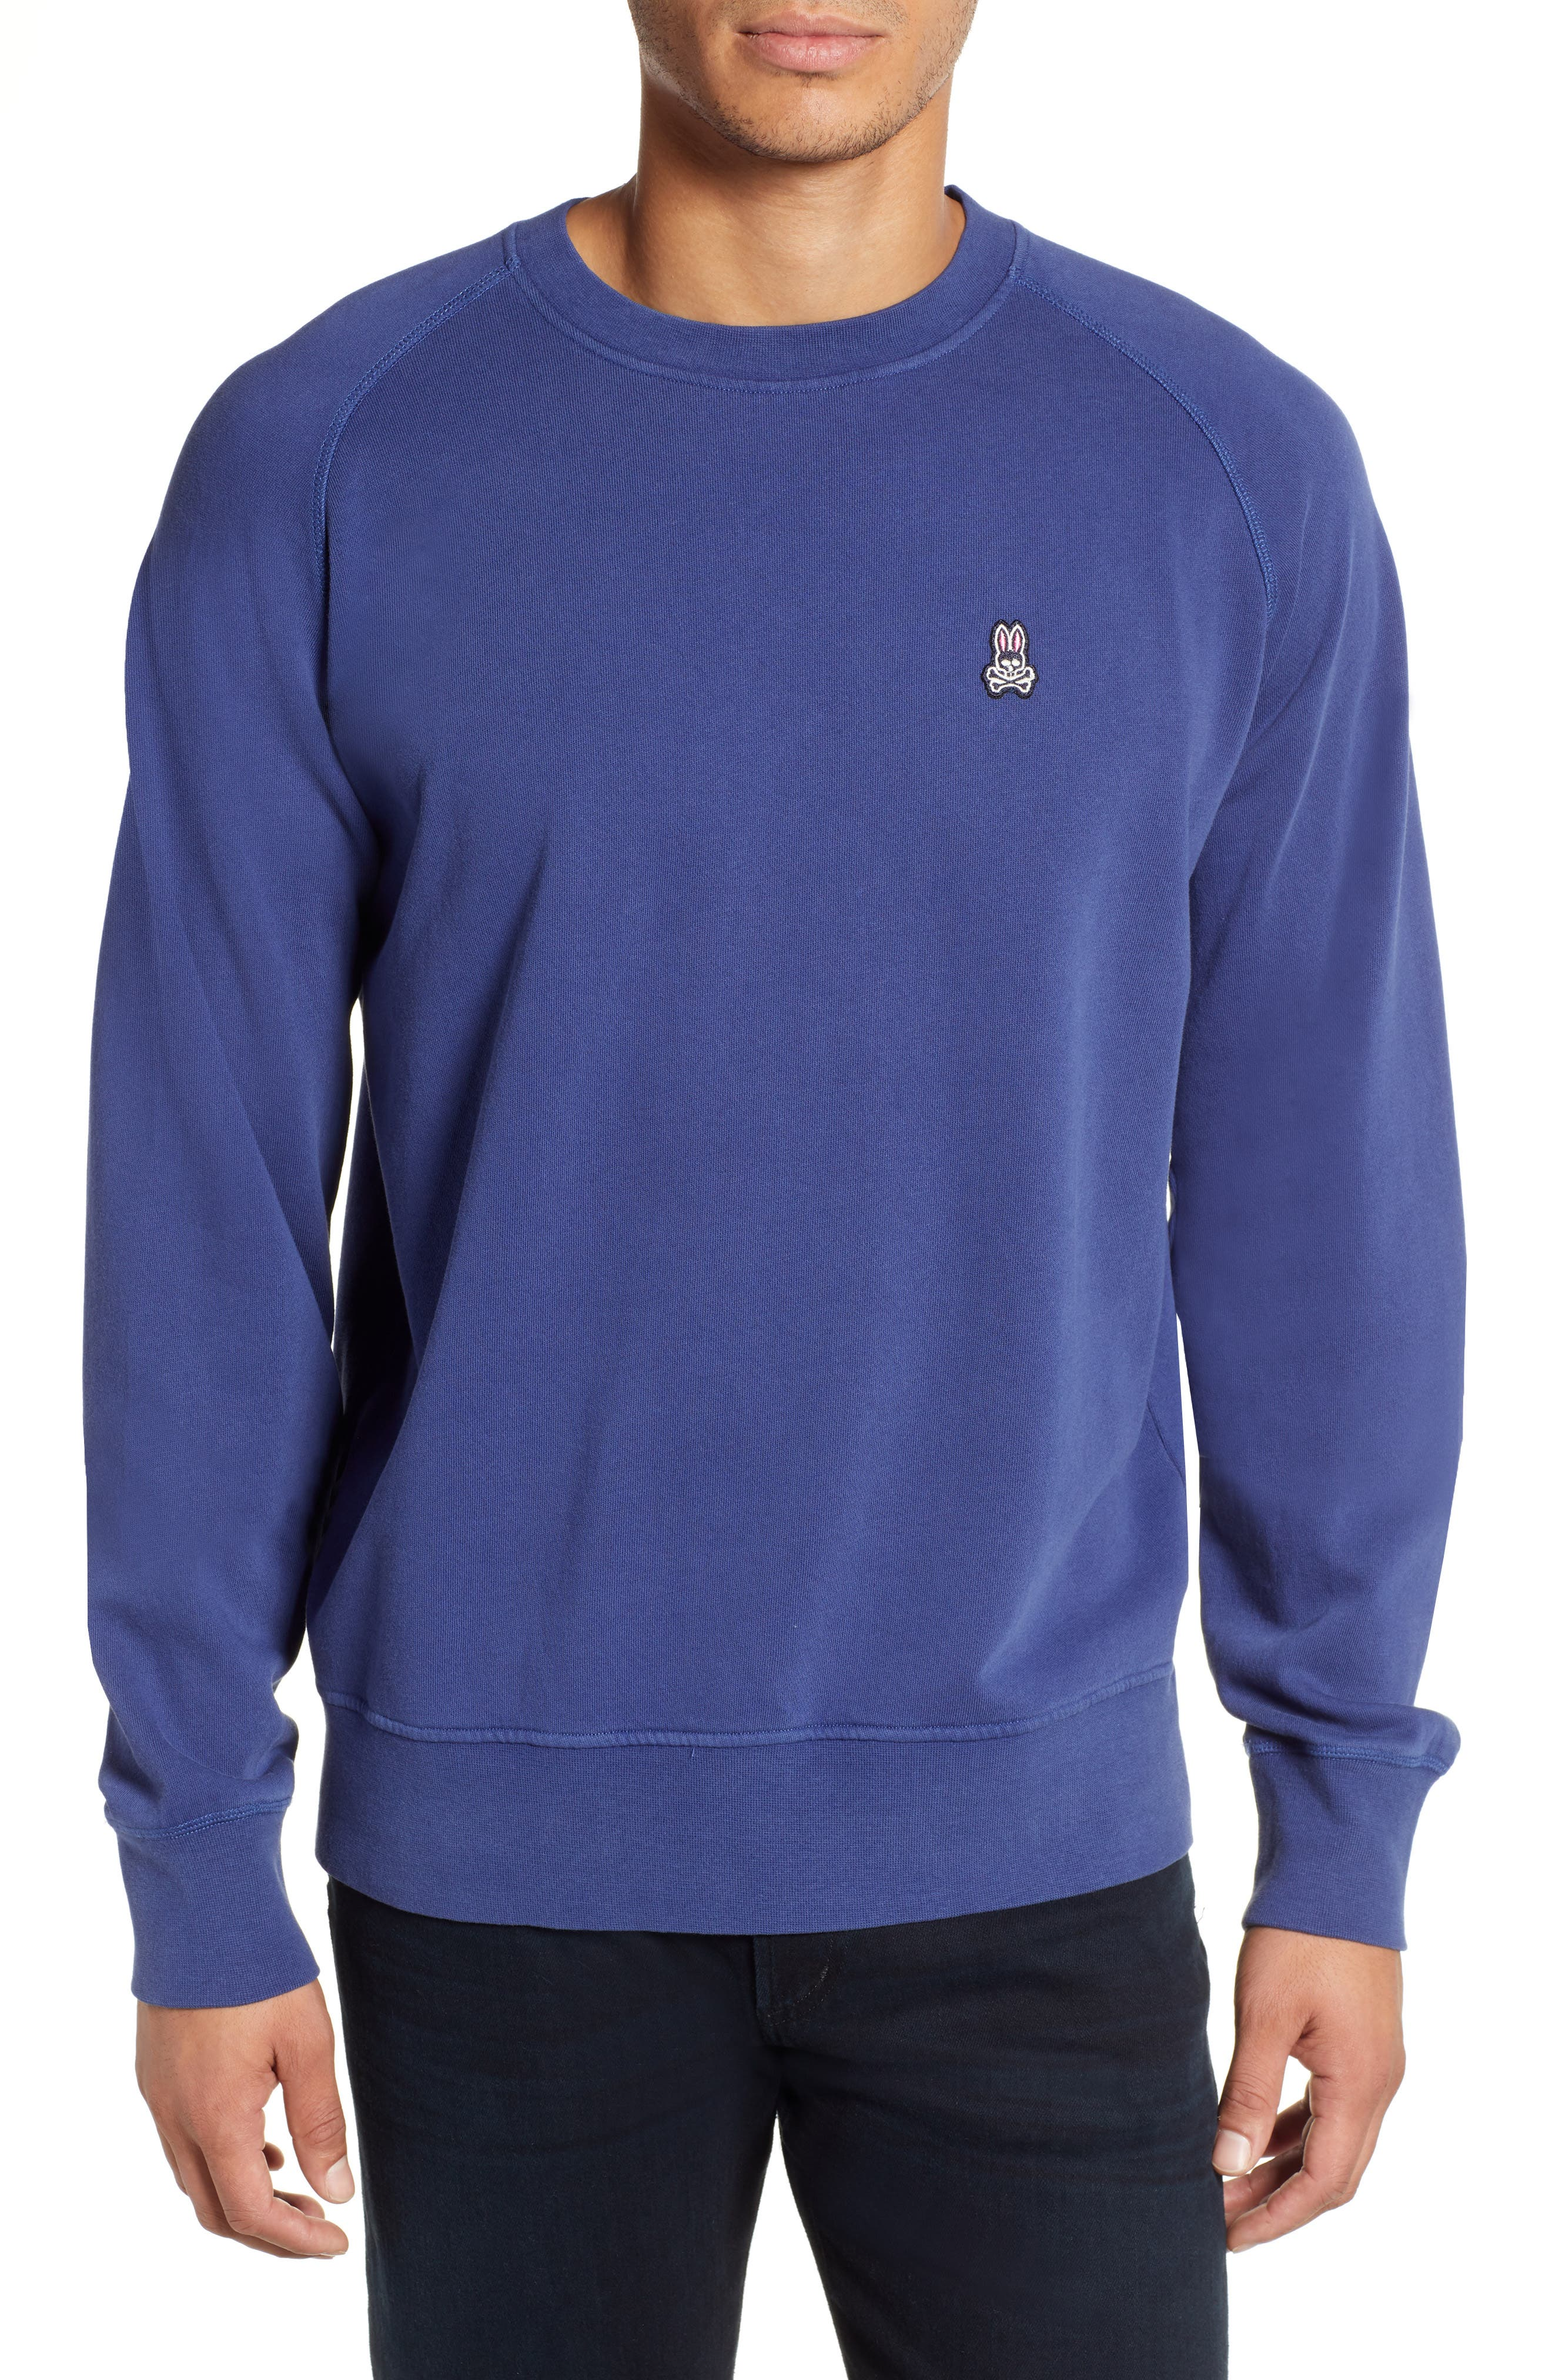 PSYCHO BUNNY Dunham Crewneck Sweatshirt in Blue Print